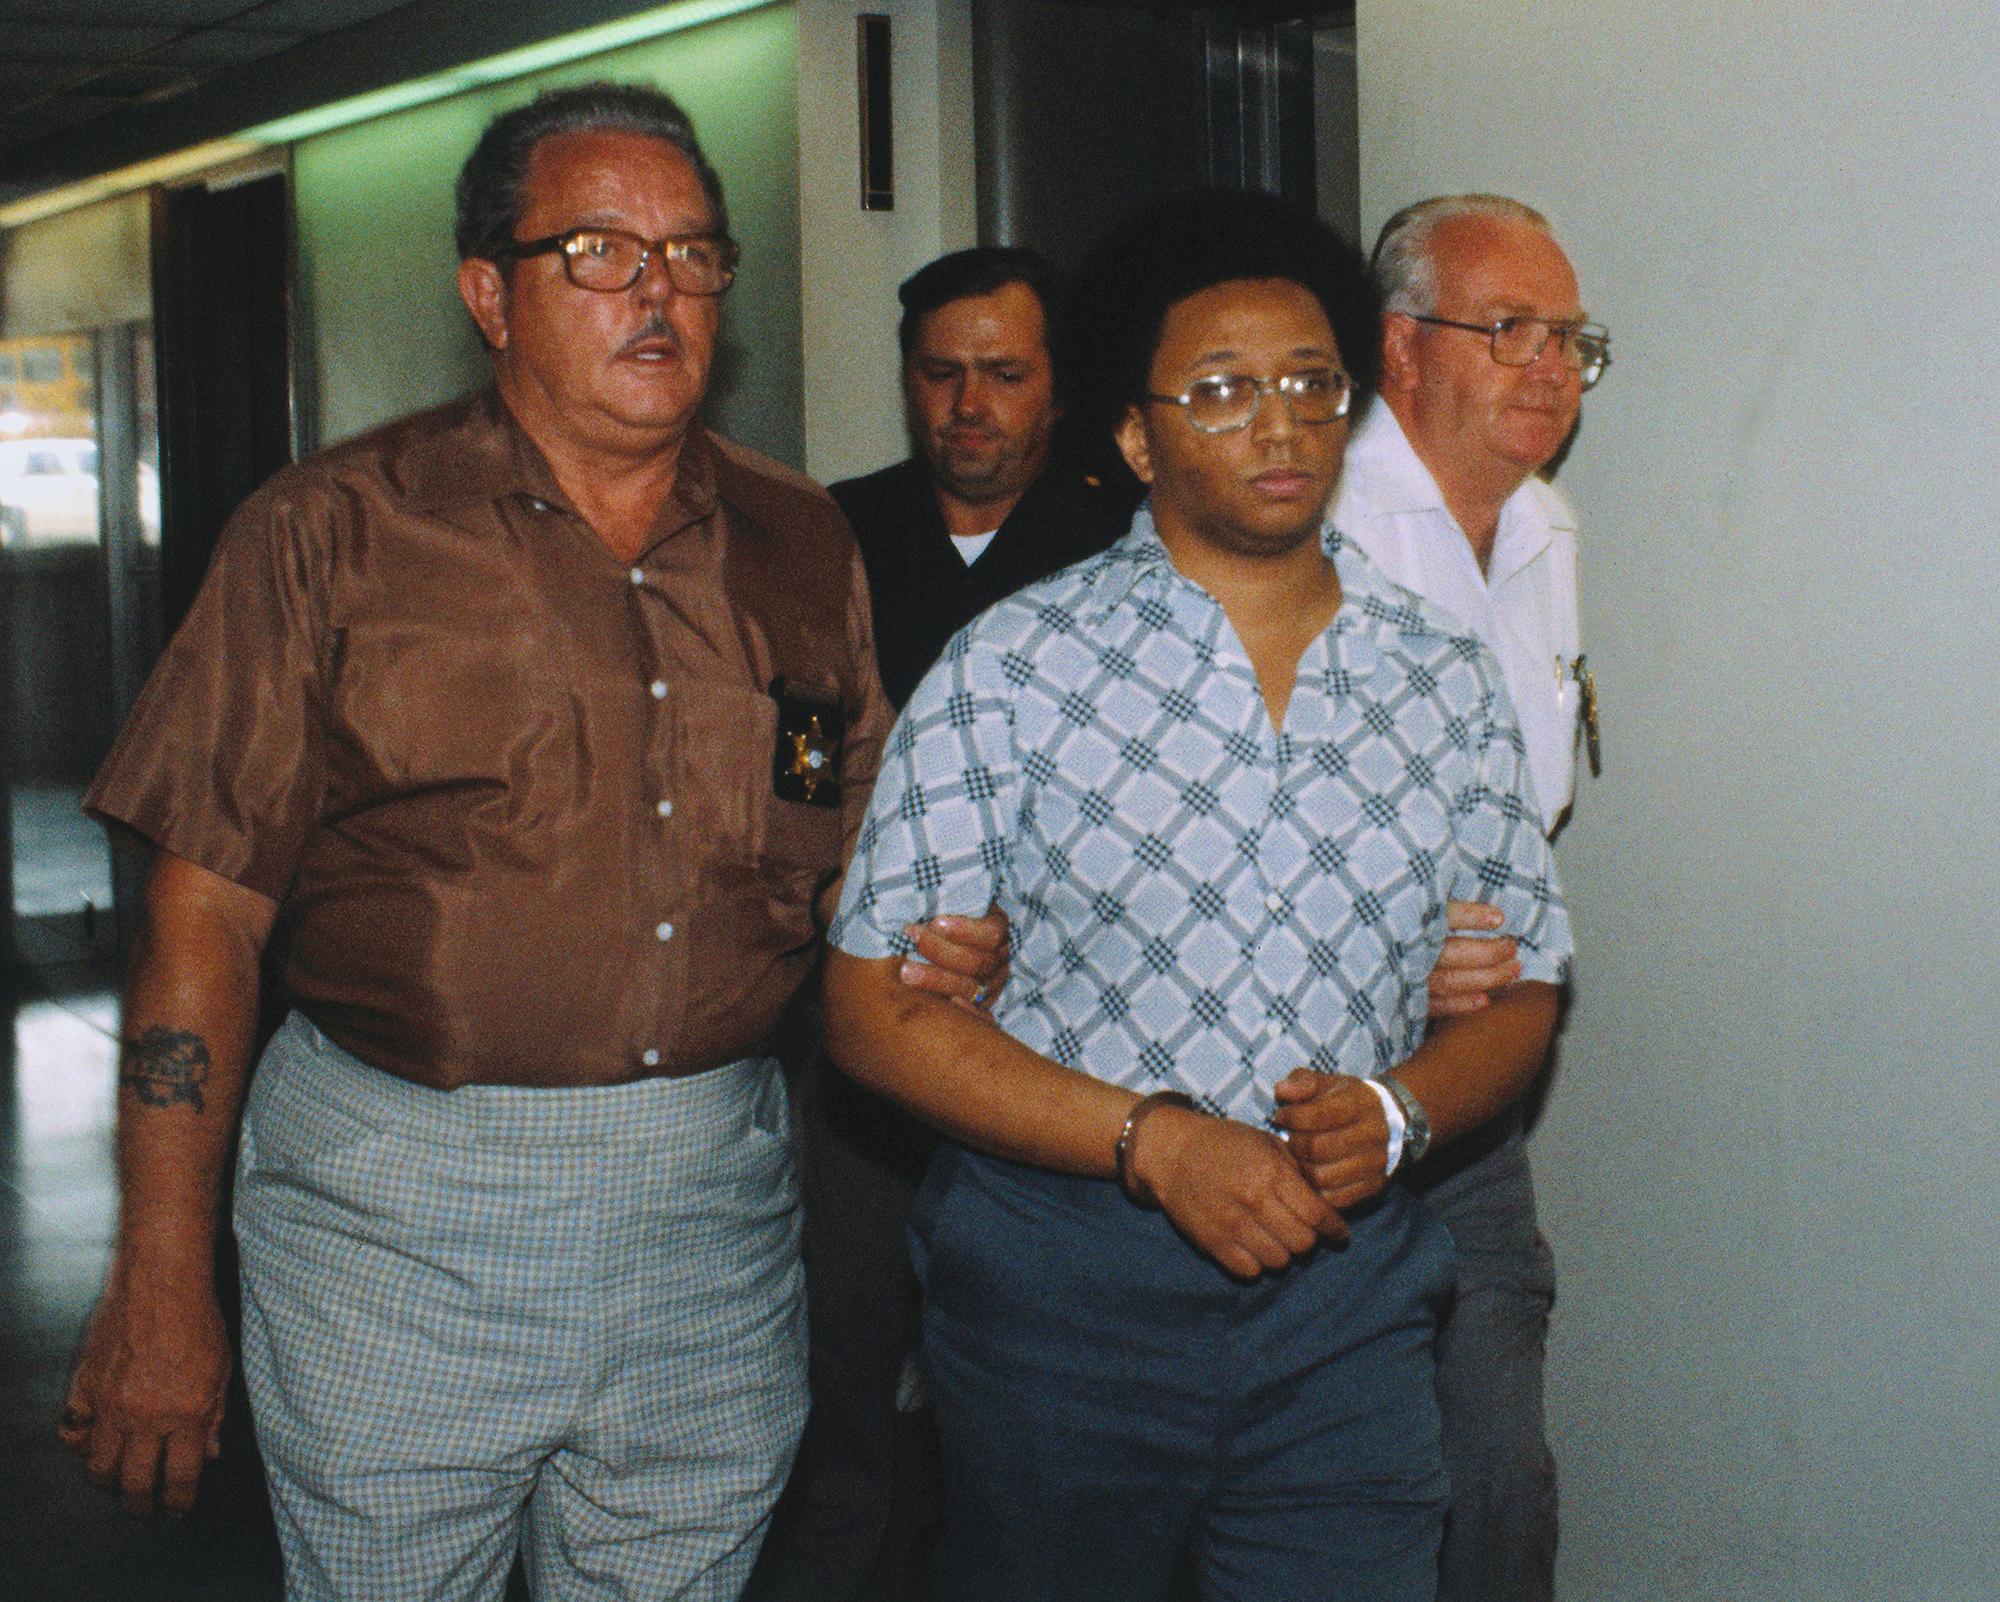 Men Leading Wayne Williams in Handcuffs